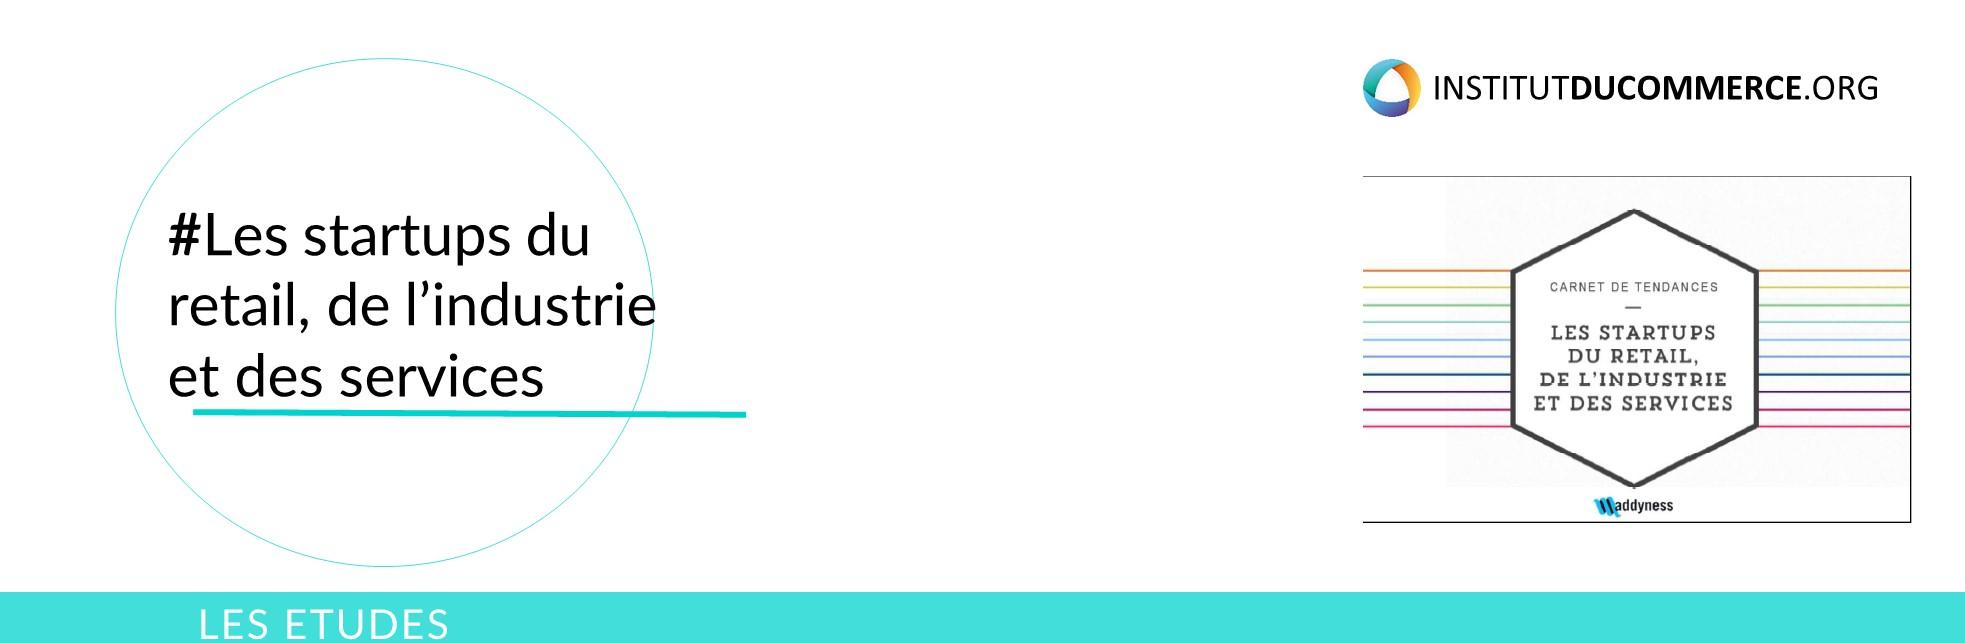 Etude IFLS-MADDYNESS : carnet de tendances Startup 2014 (Archives IFLS)